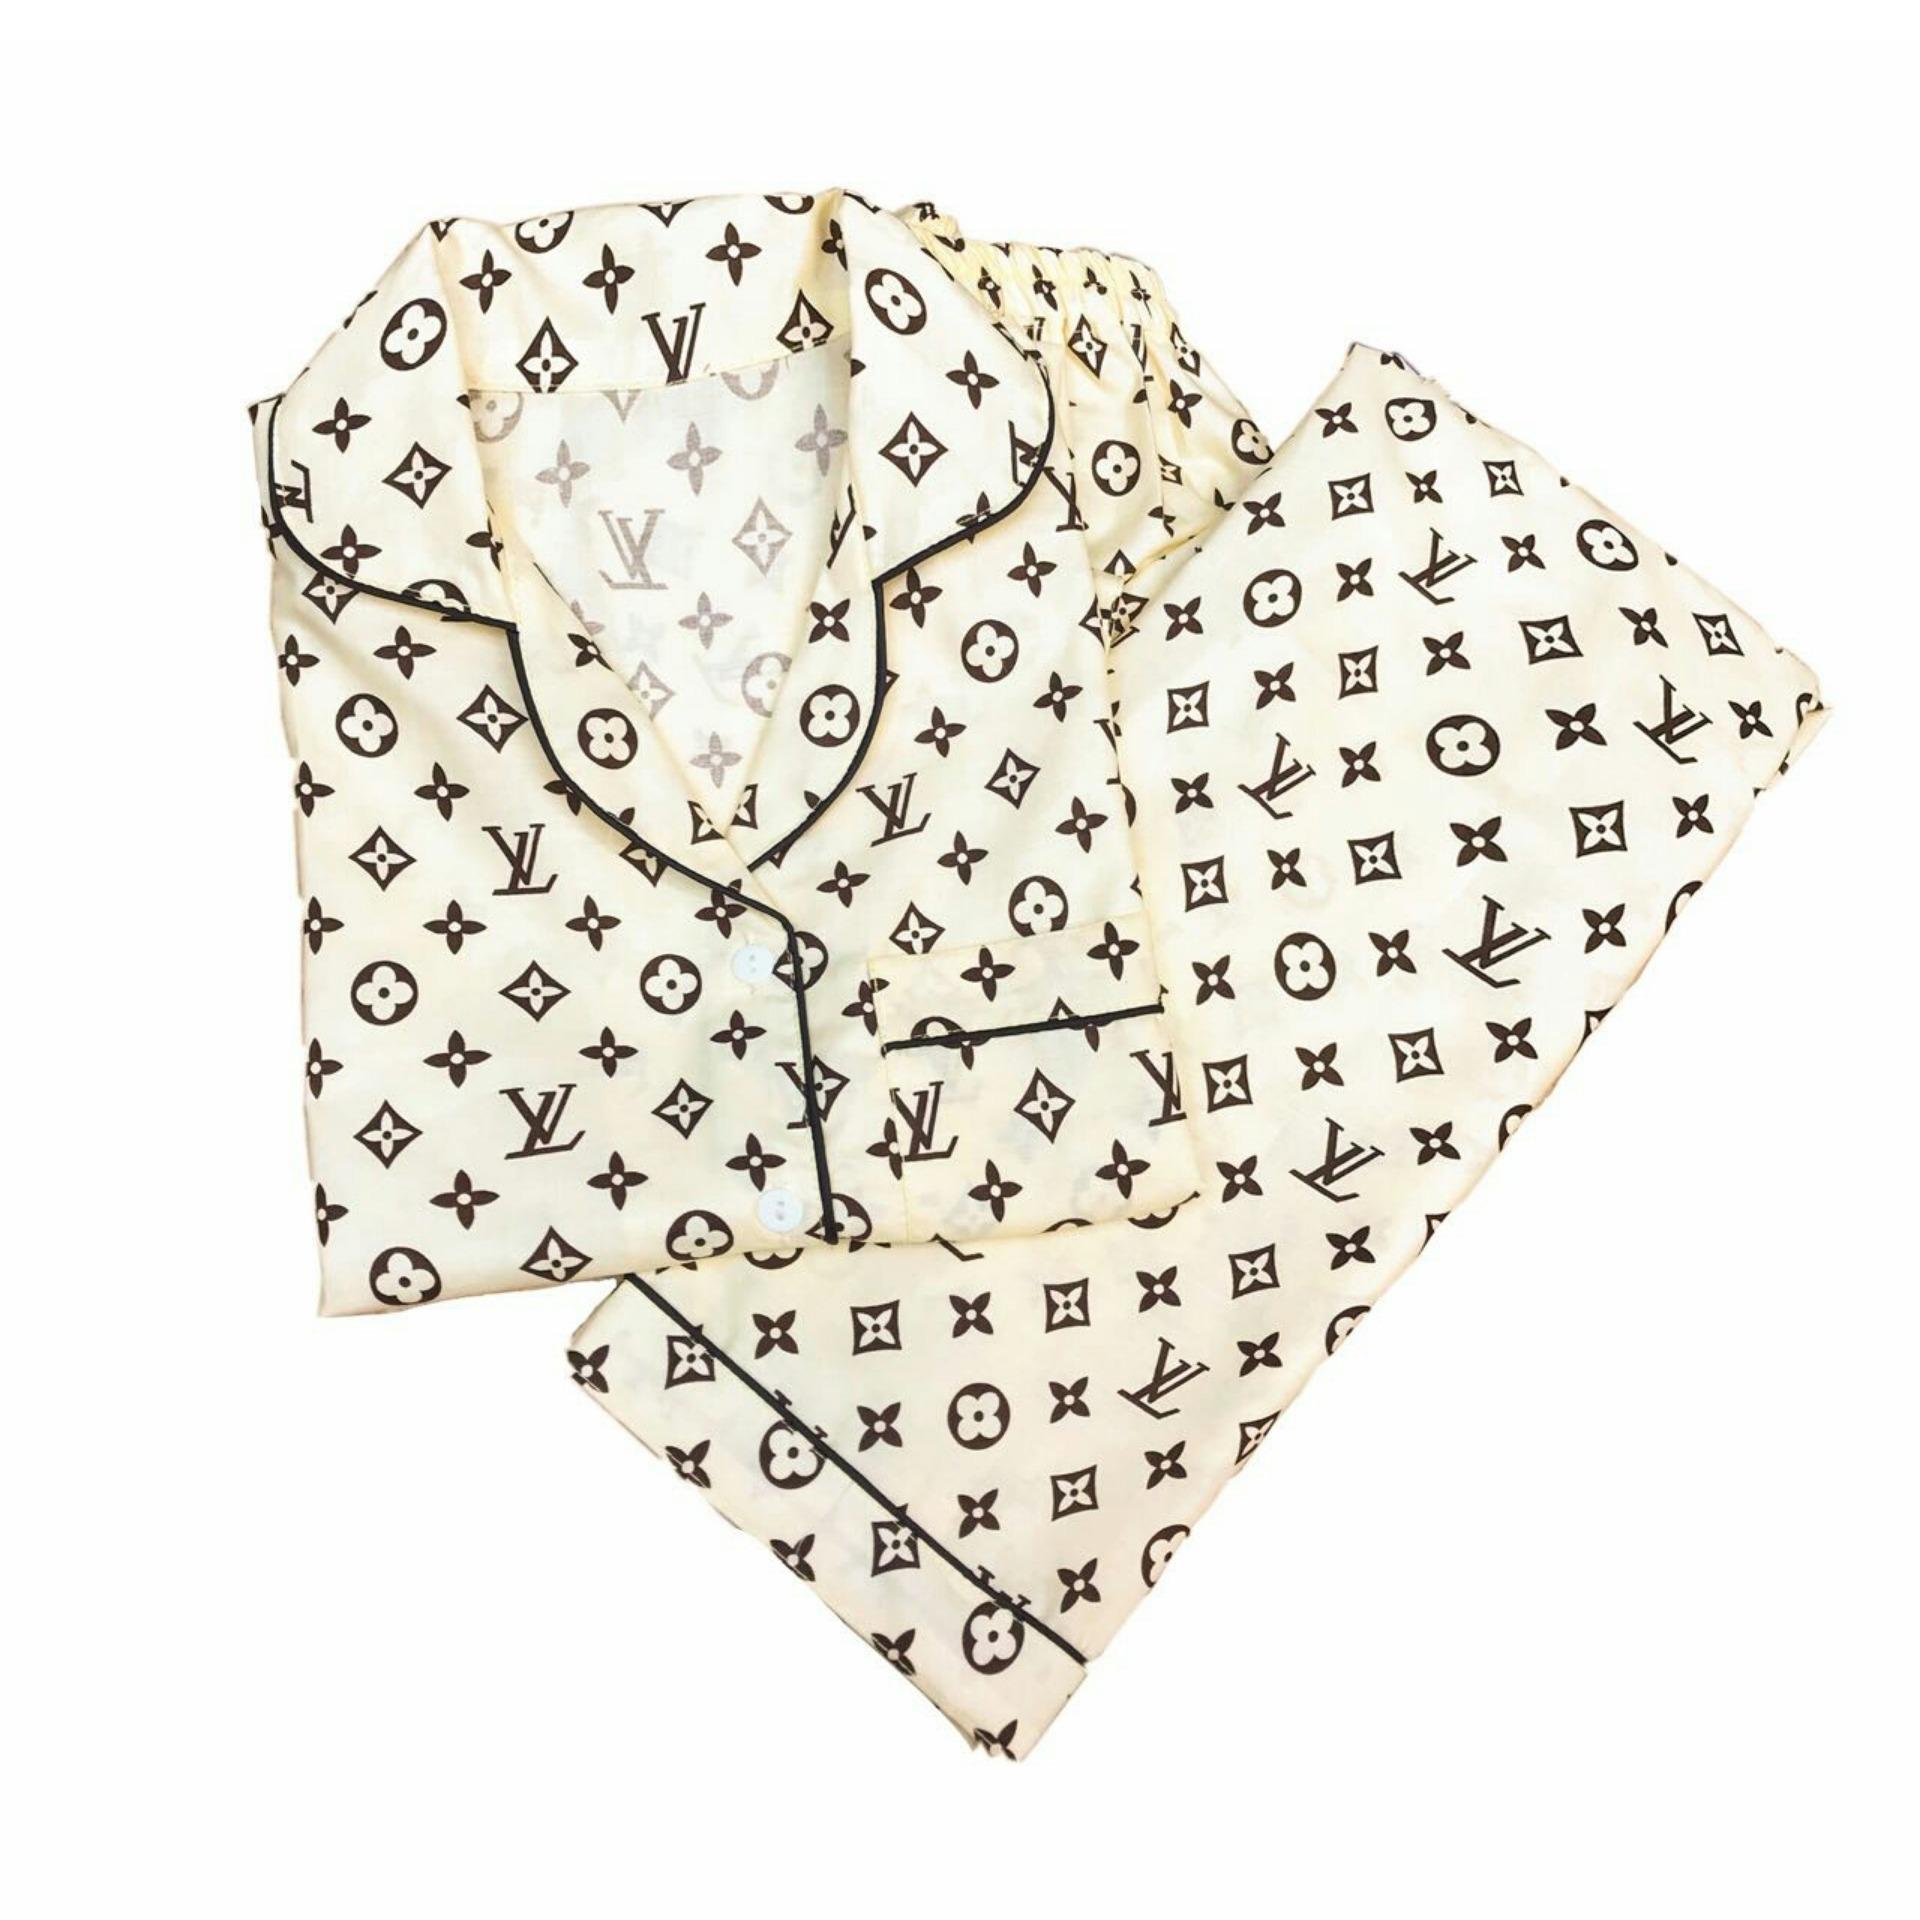 rgs store piyama  baju tidur dewasa LV krem dan brown cp fit to M/L karakter baju tidur